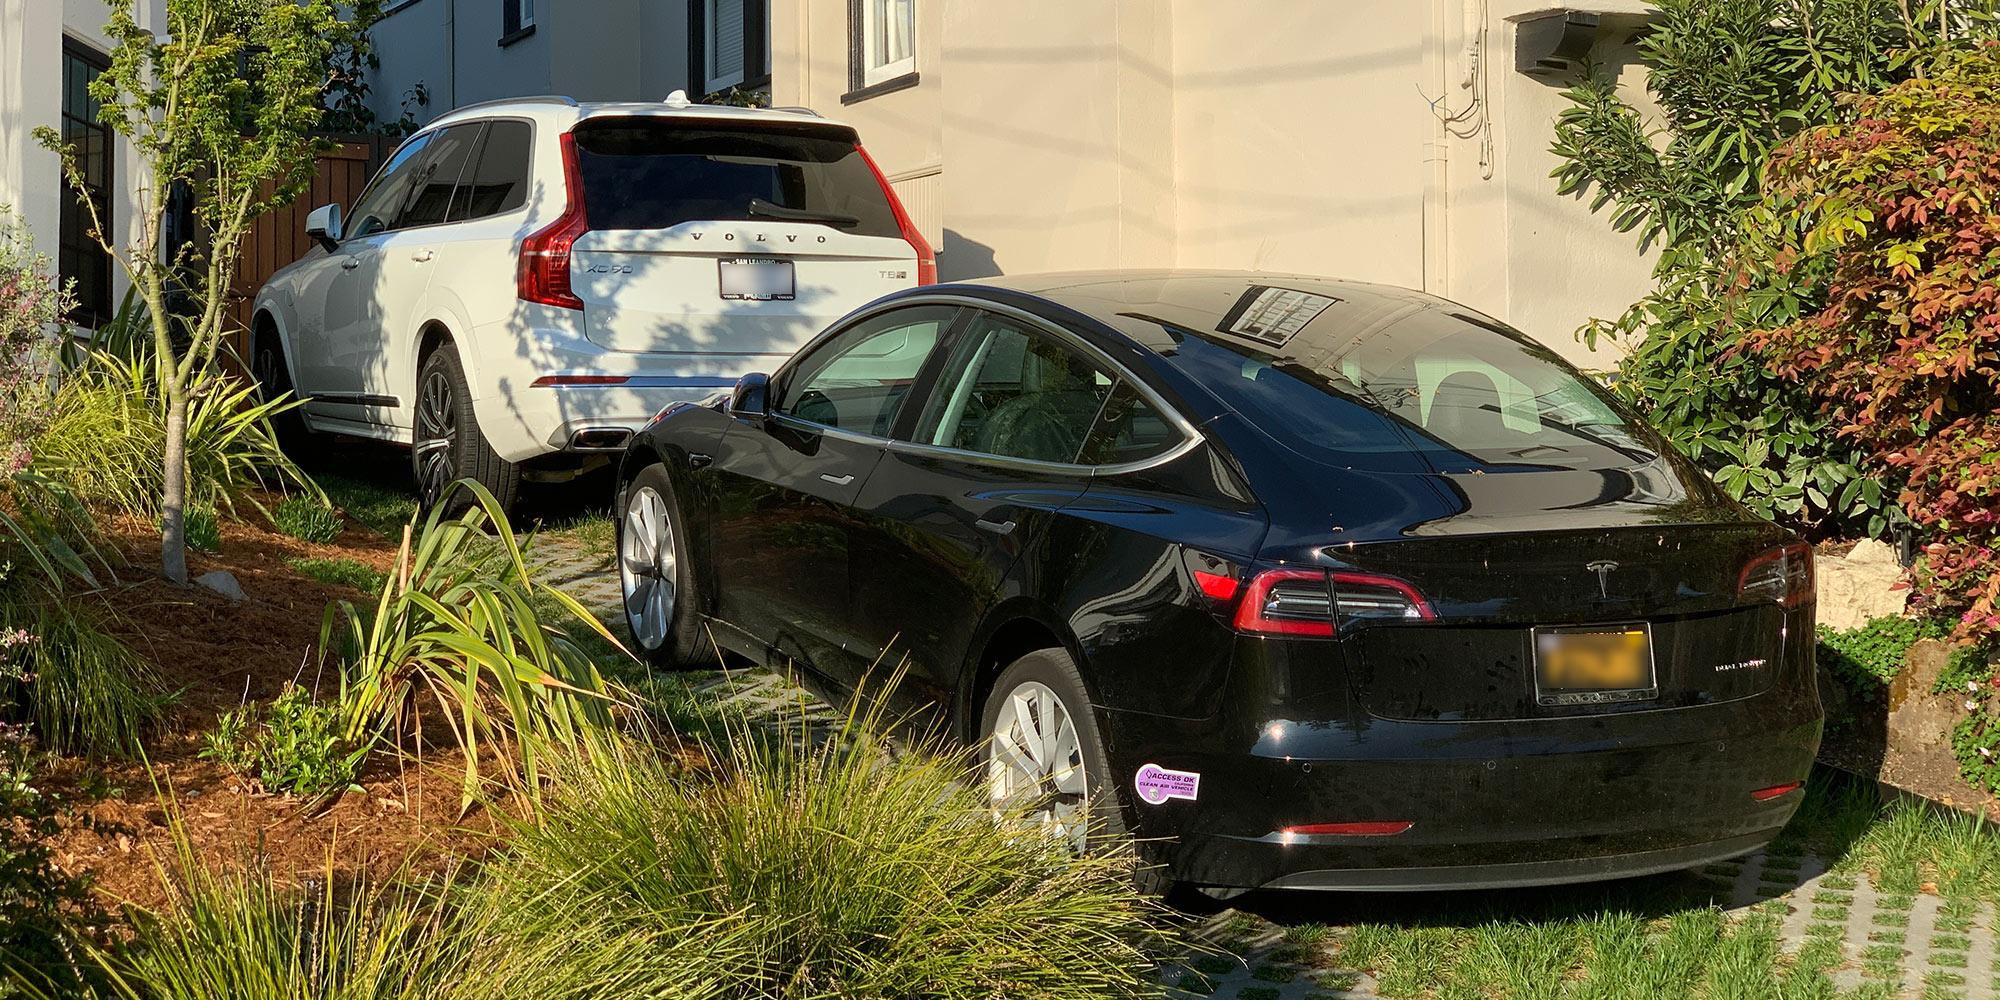 Tesla Model 3 and Volvo Plug-in Hybrid